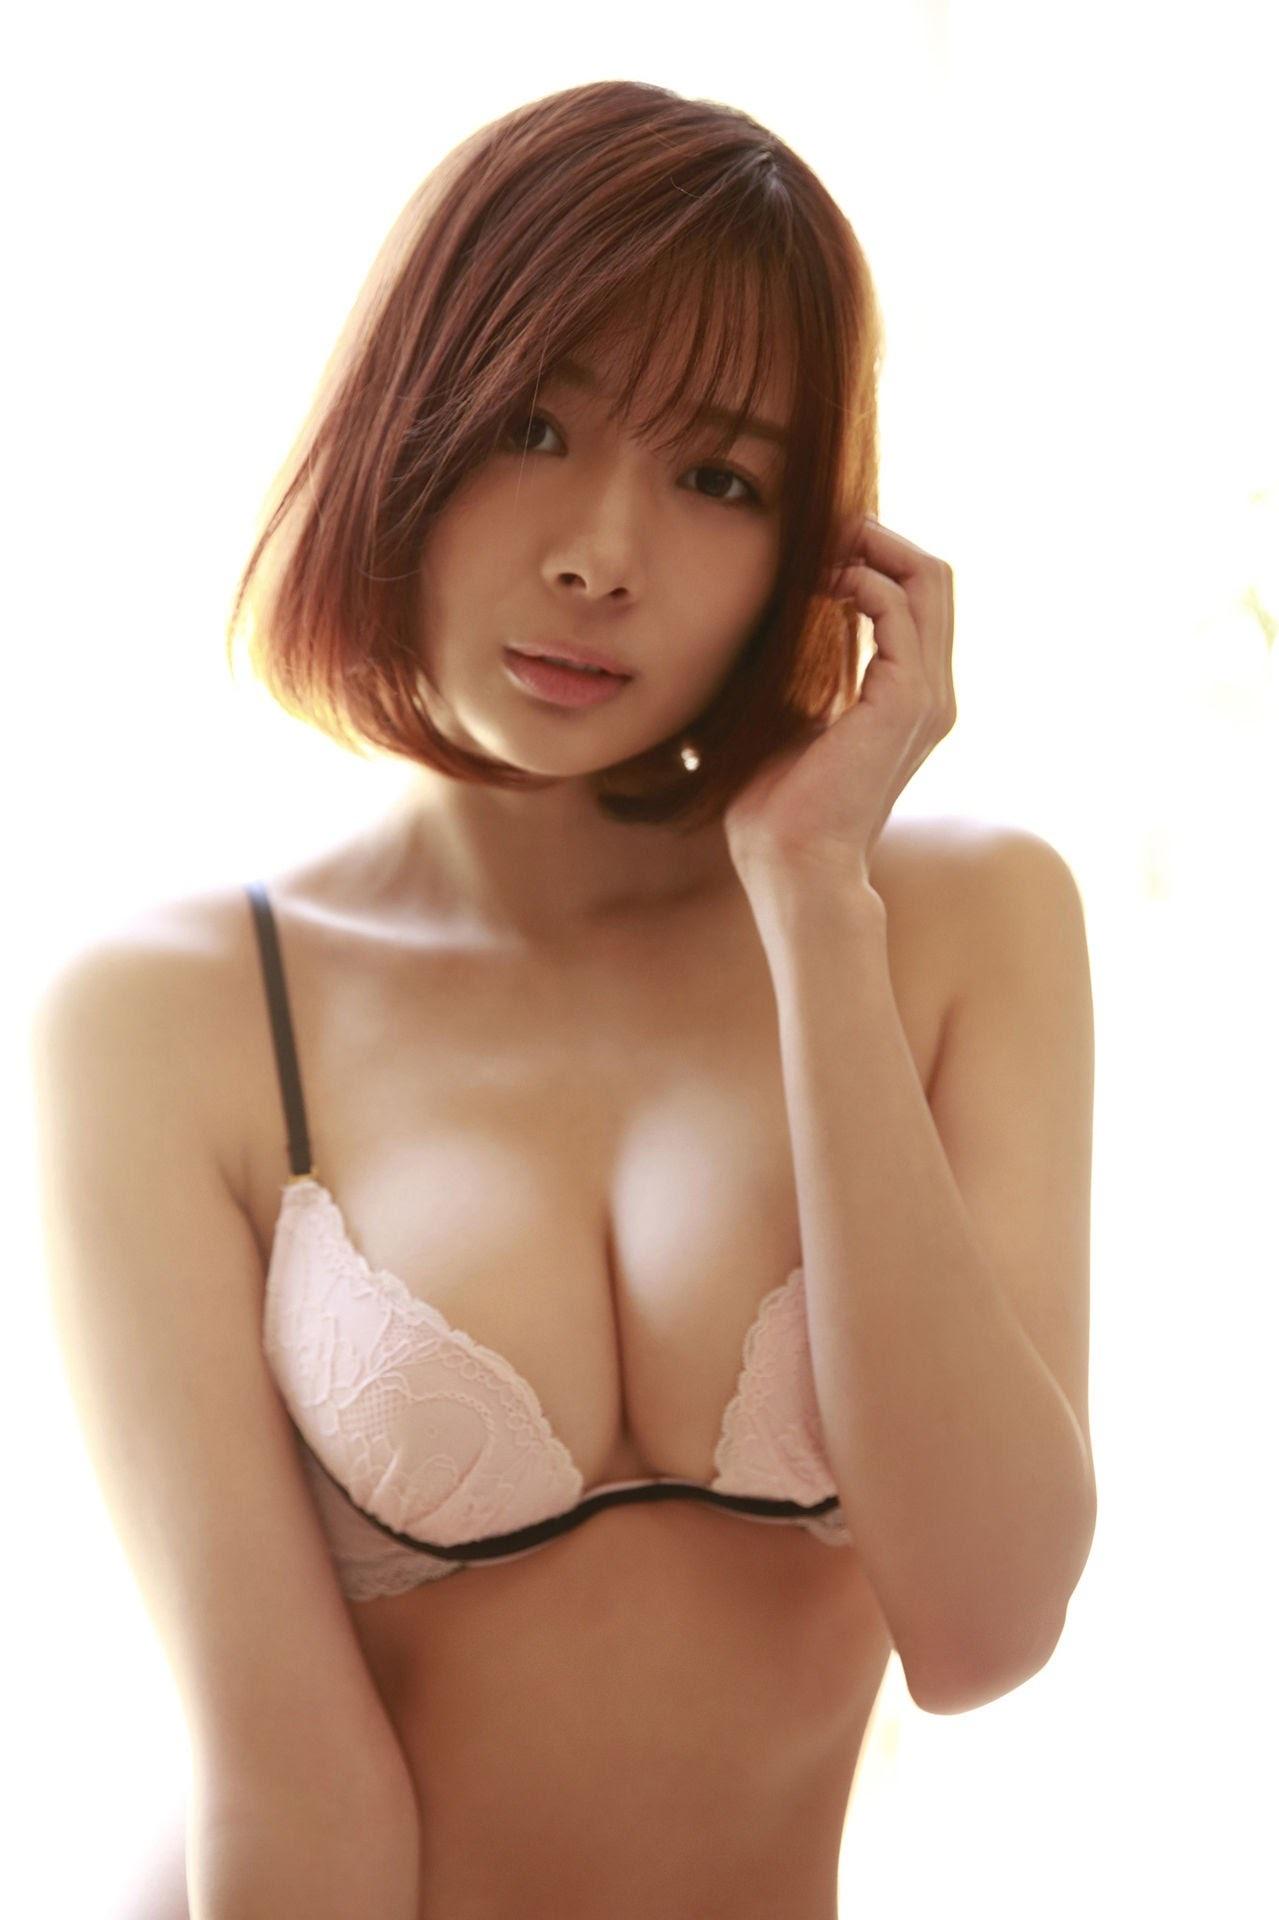 23 years old Shaka Okada, who is also a professional mahjong player030